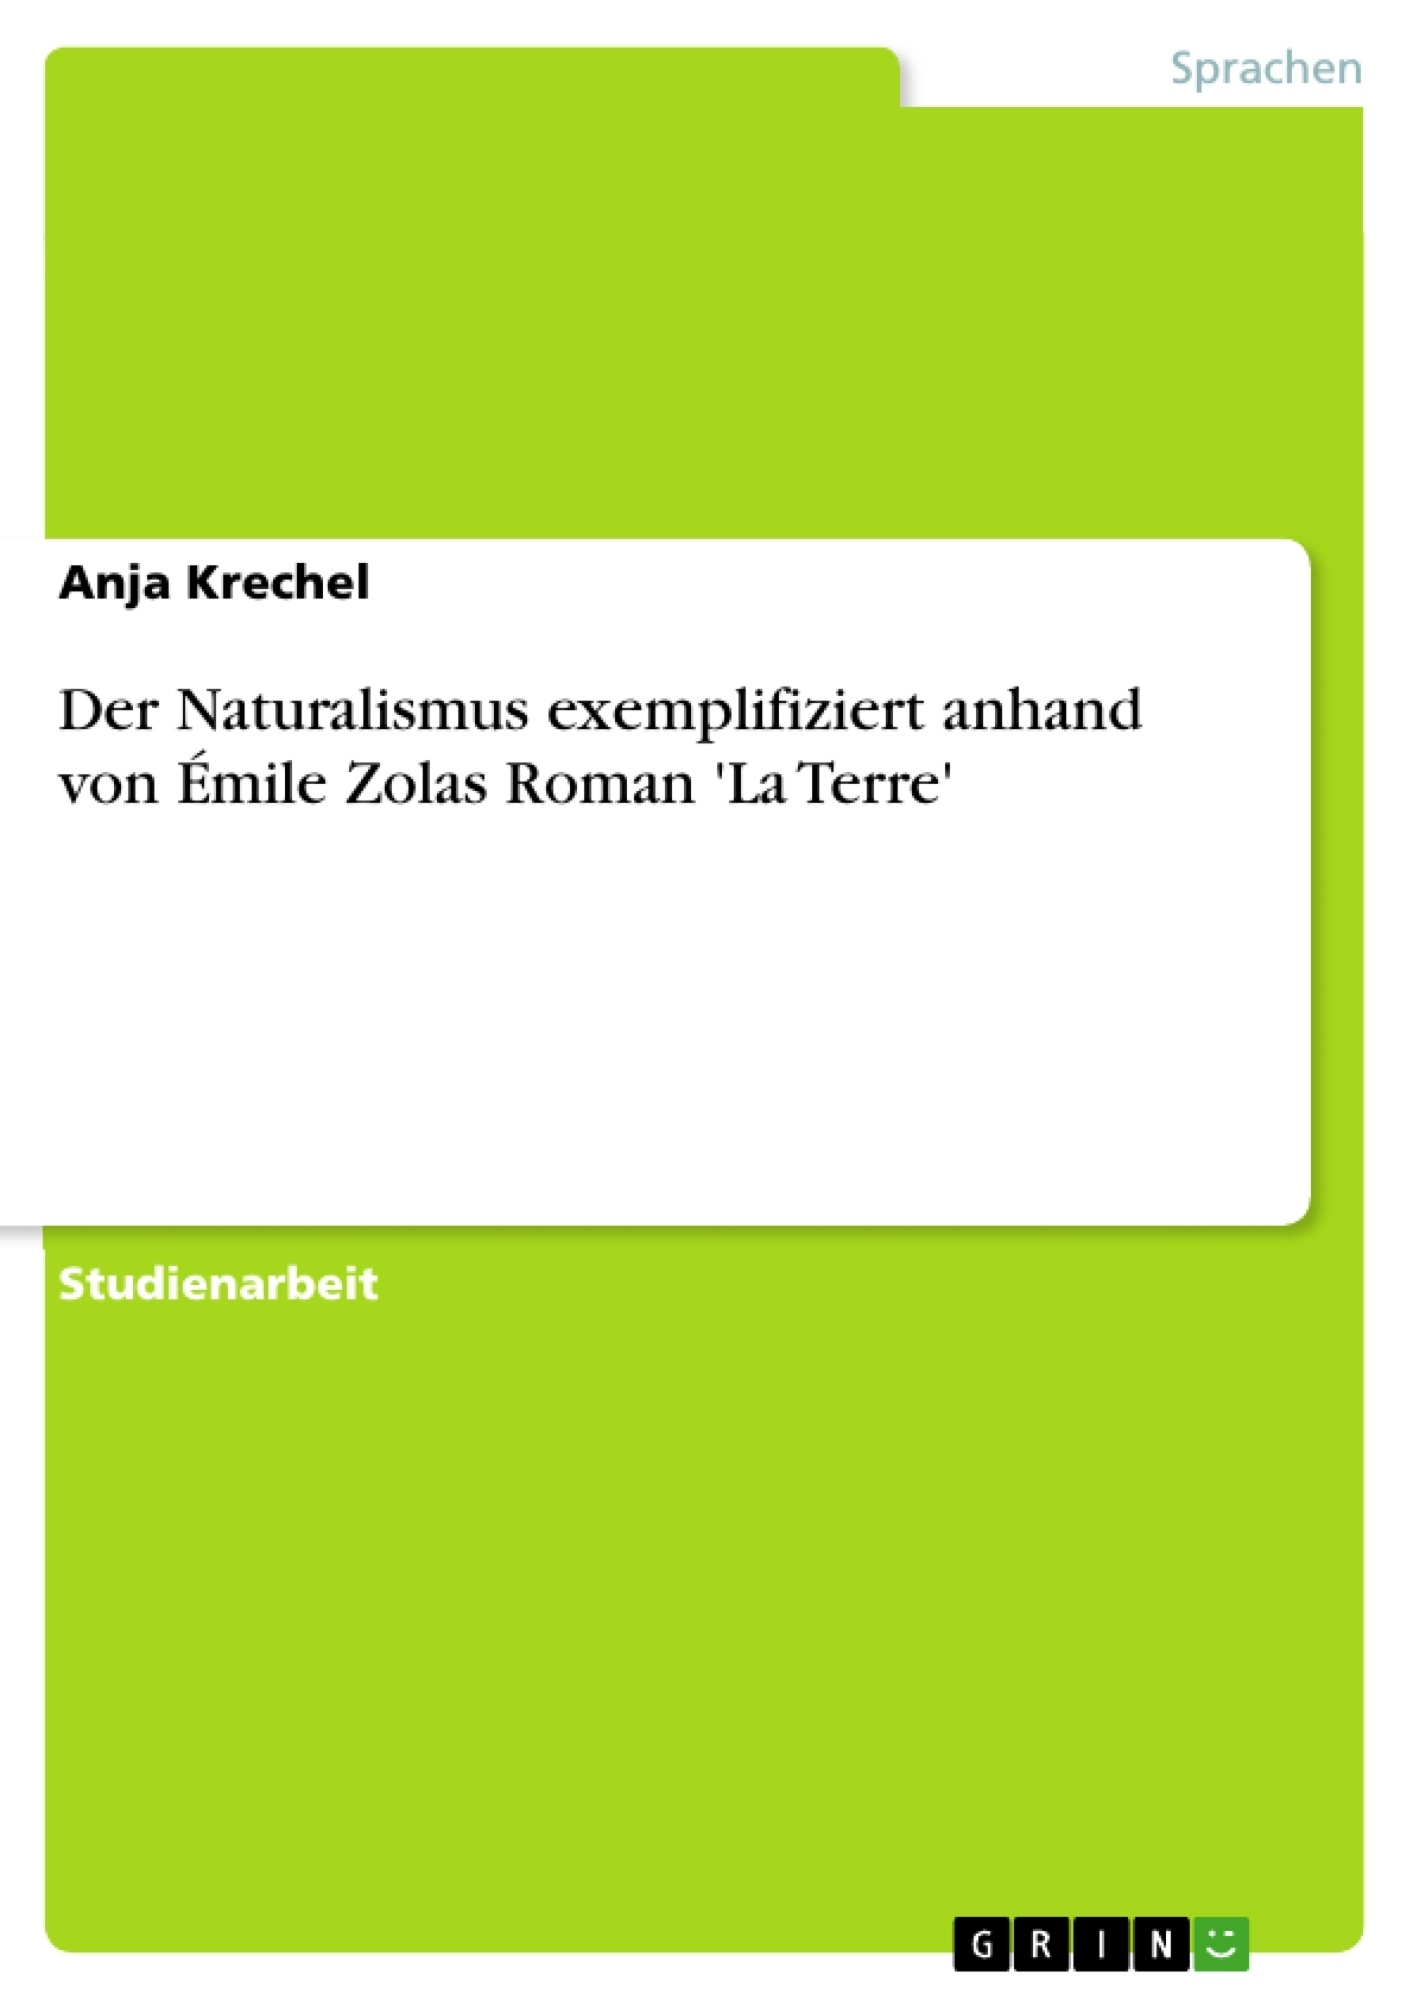 Titel: Der Naturalismus exemplifiziert anhand von Émile Zolas Roman 'La Terre'